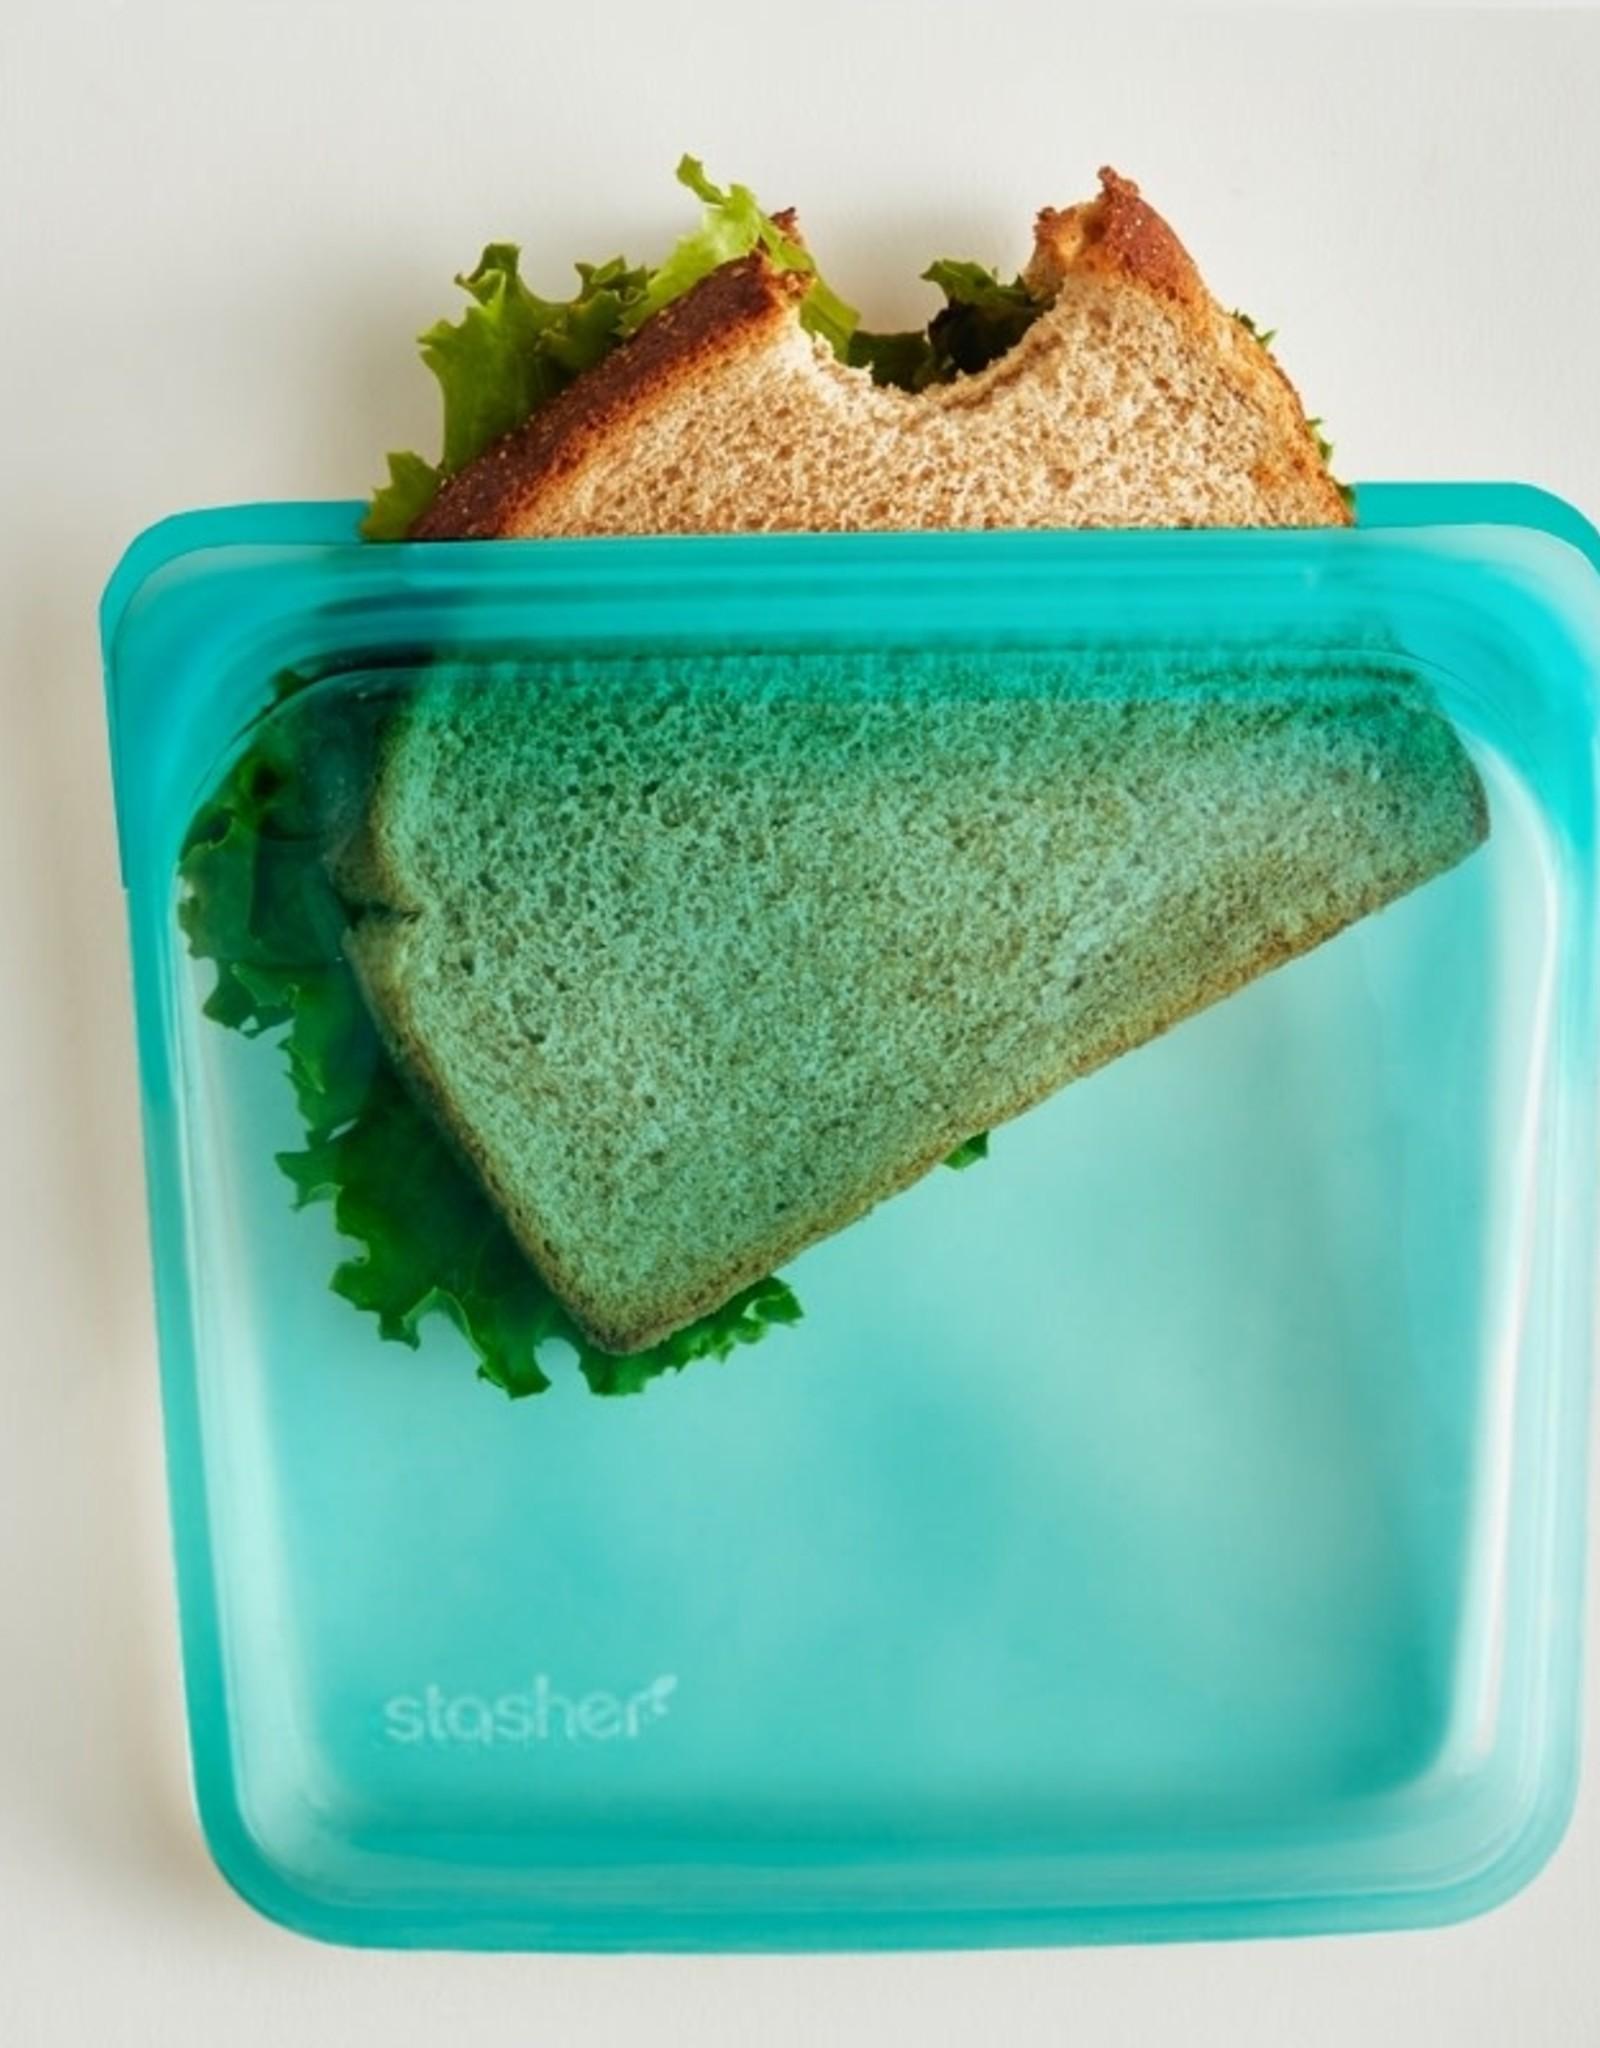 Stasher Sac stasher moyen Turquoise